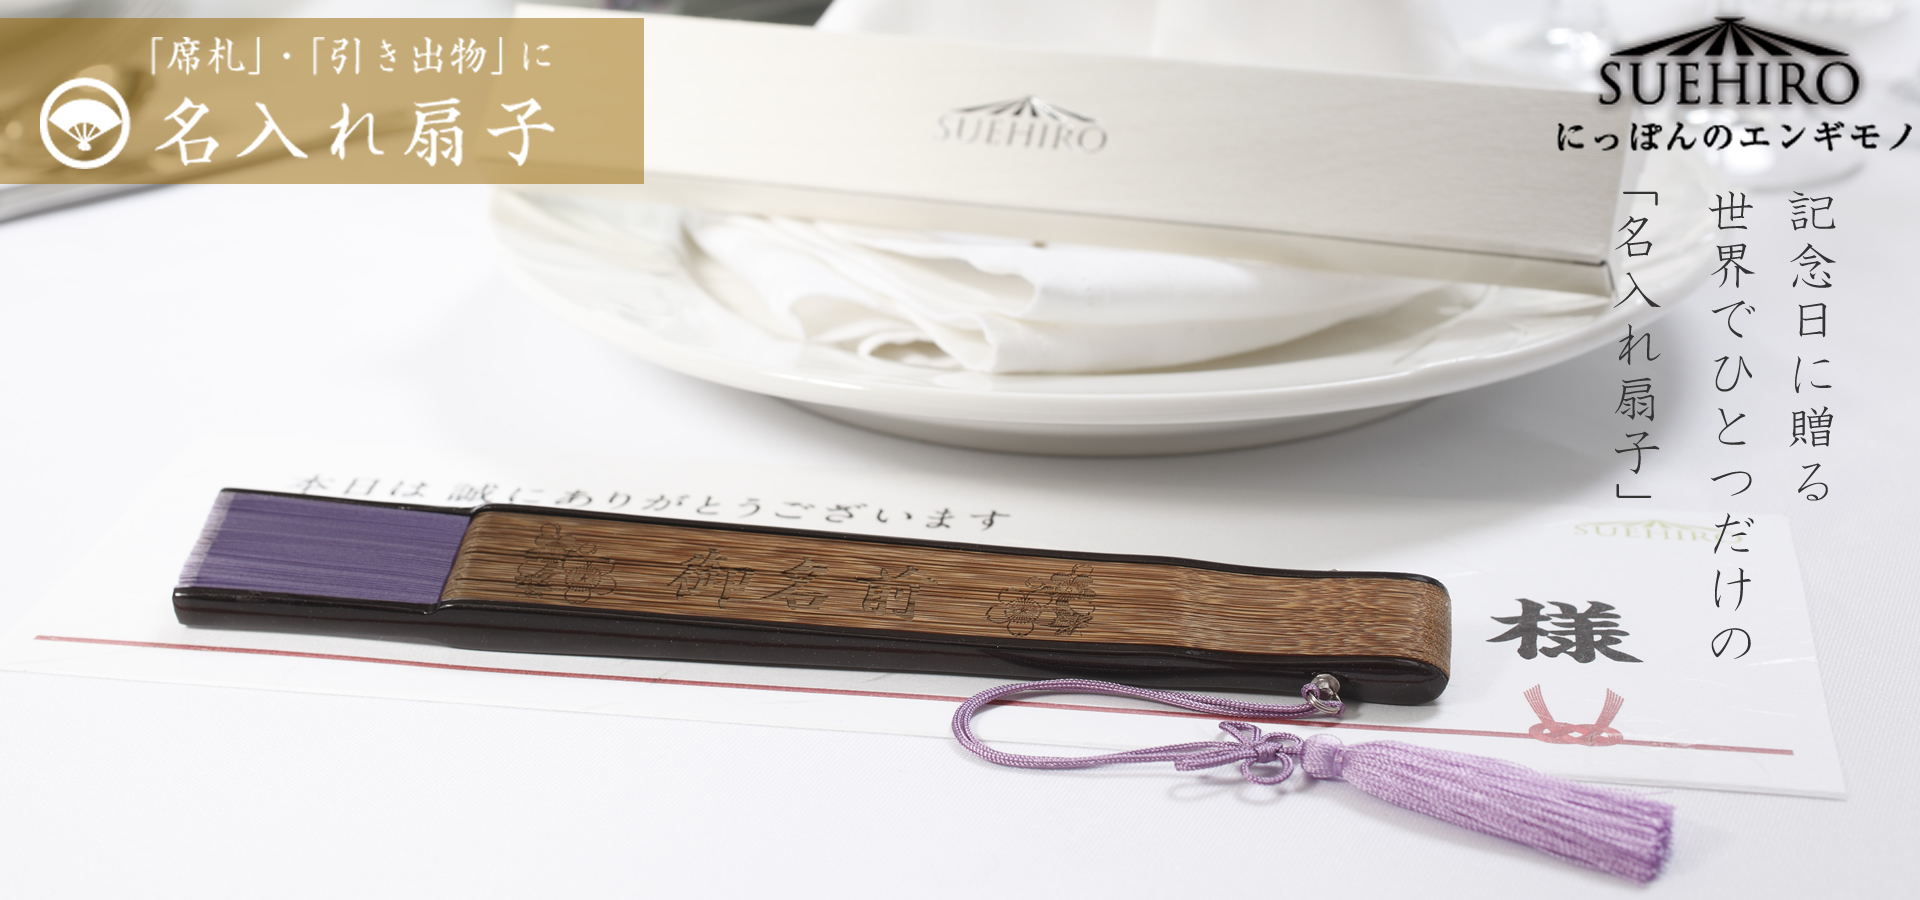 Poke扇(Pokesen)は「扇子を纏う」をコンセプトに、扇面と同素材、同柄のチーフをセットにした新しい扇子です